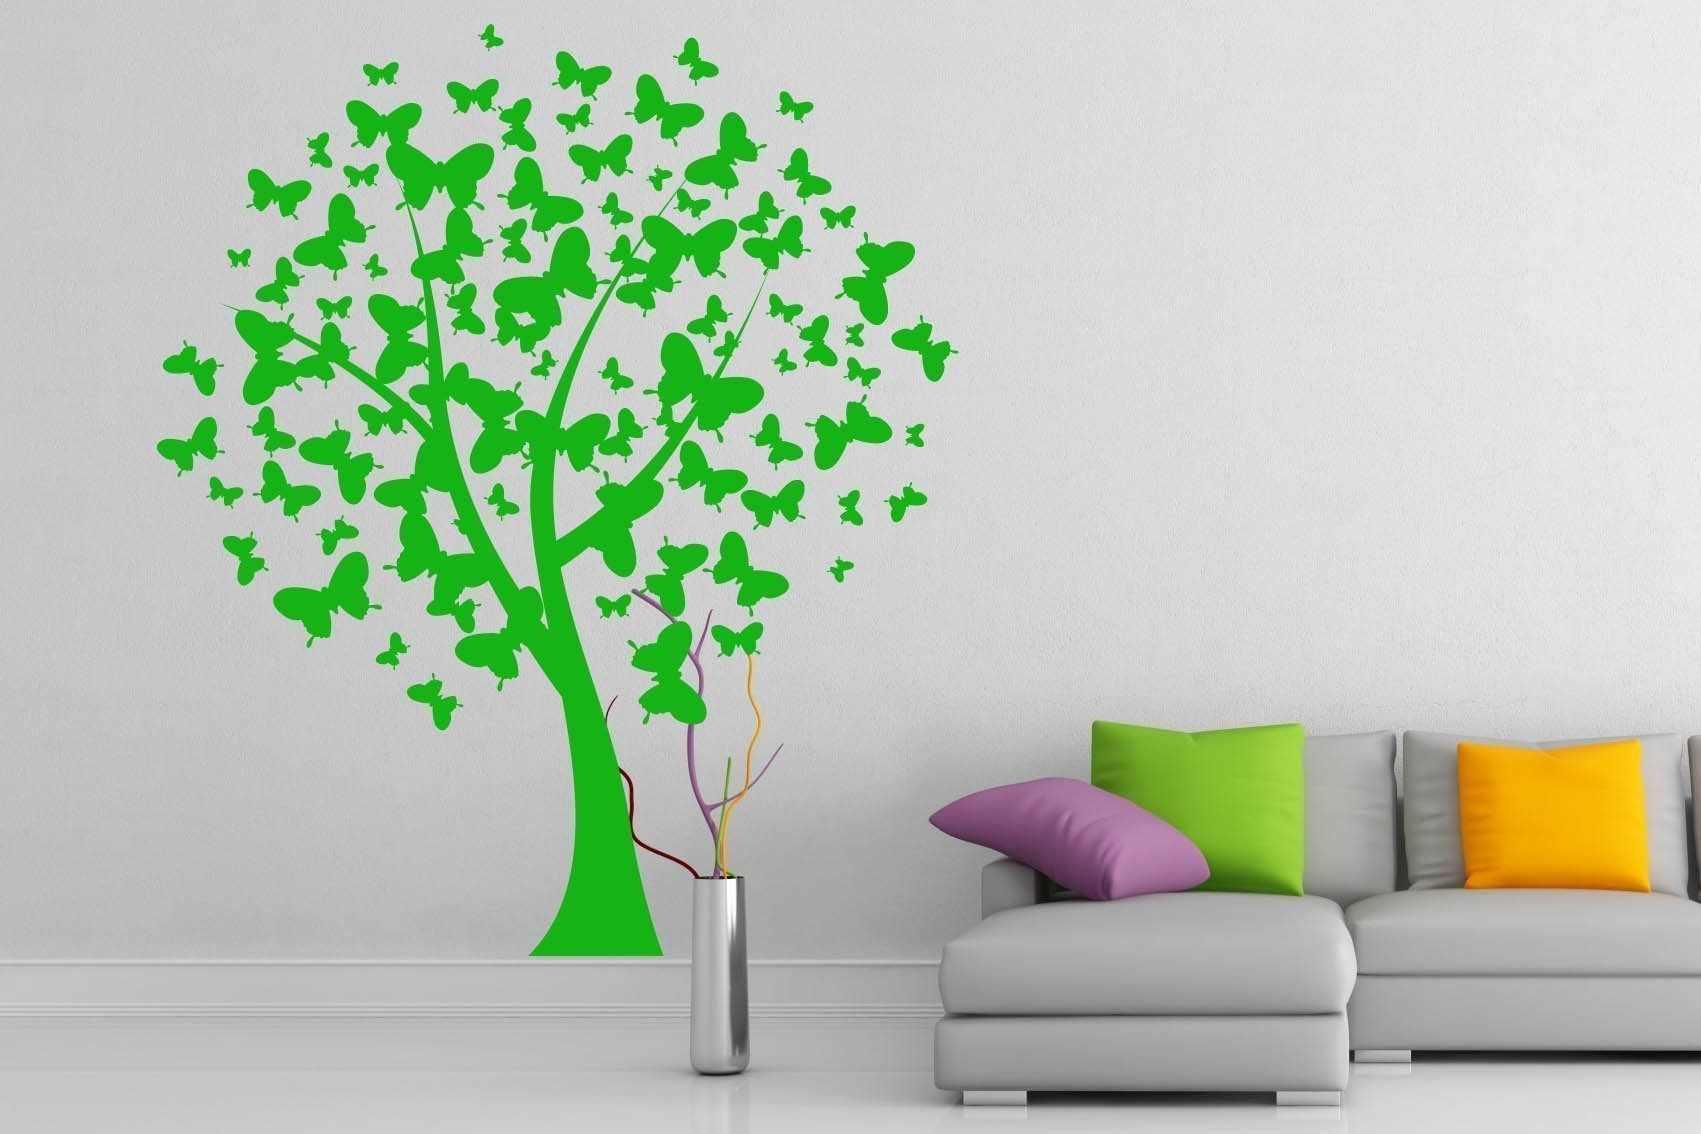 Зеленое дерево на белой стене